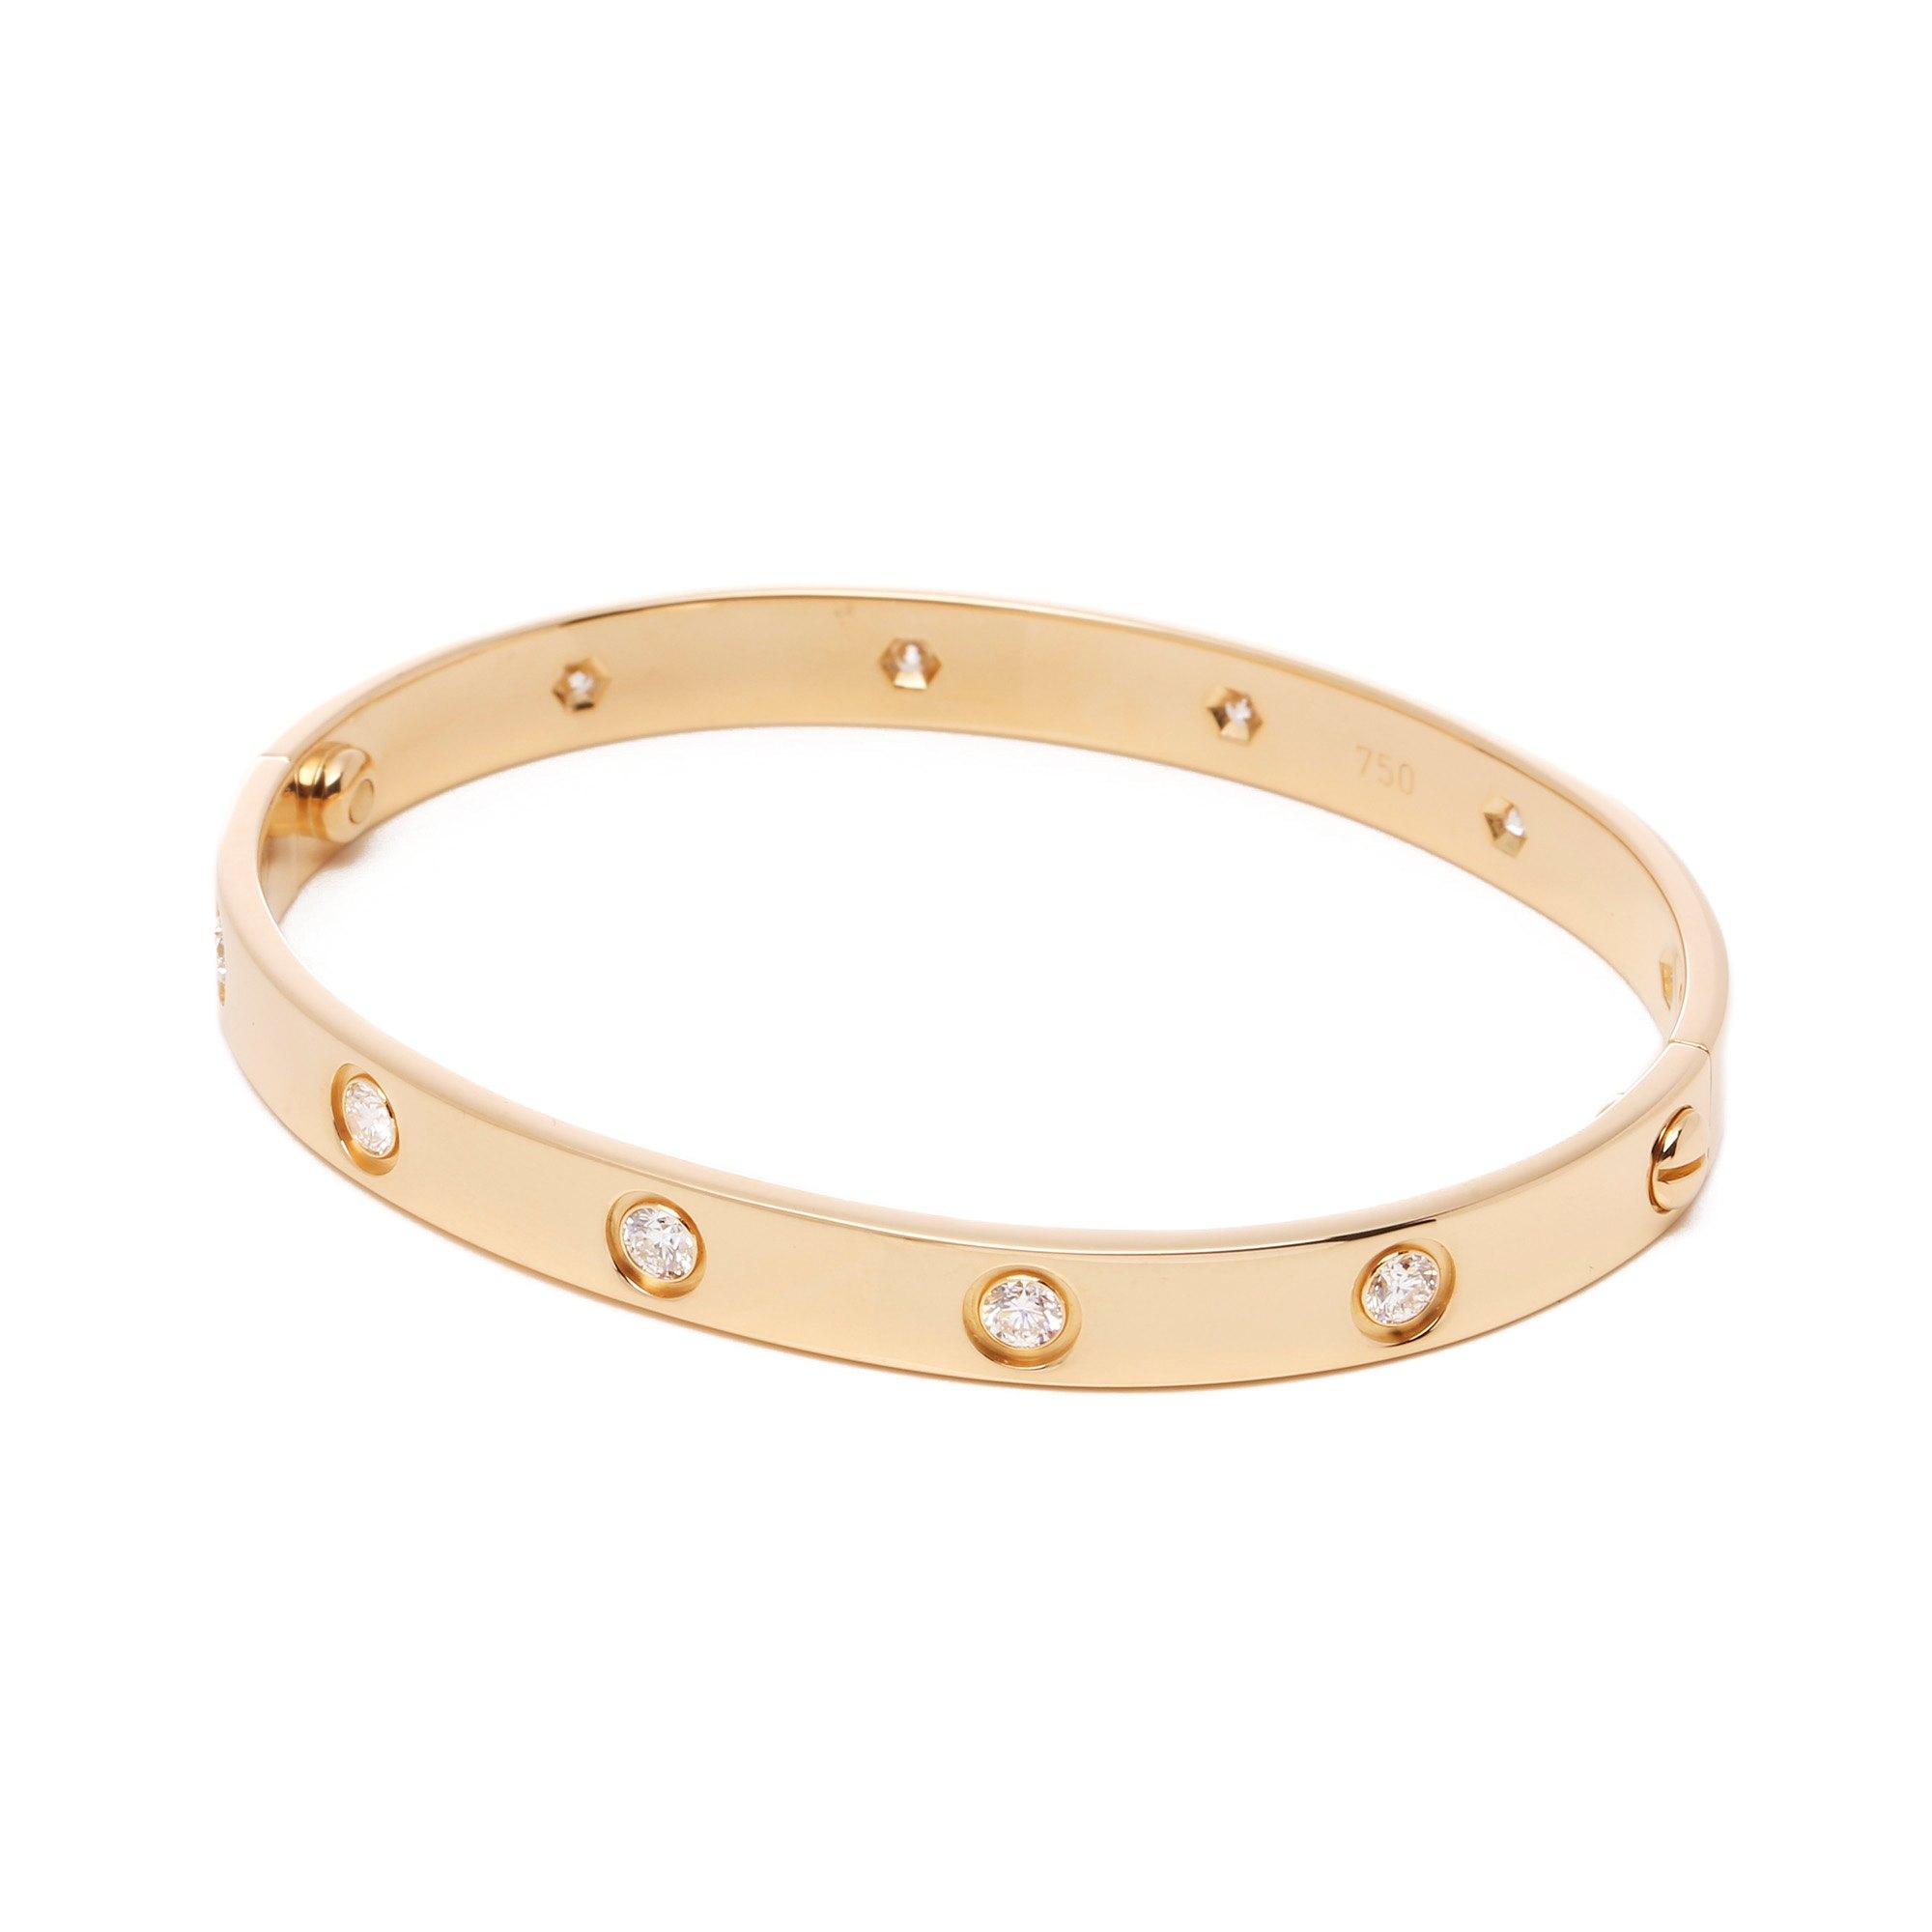 Cartier Love 10 Diamond 18ct Yellow Gold Bangle